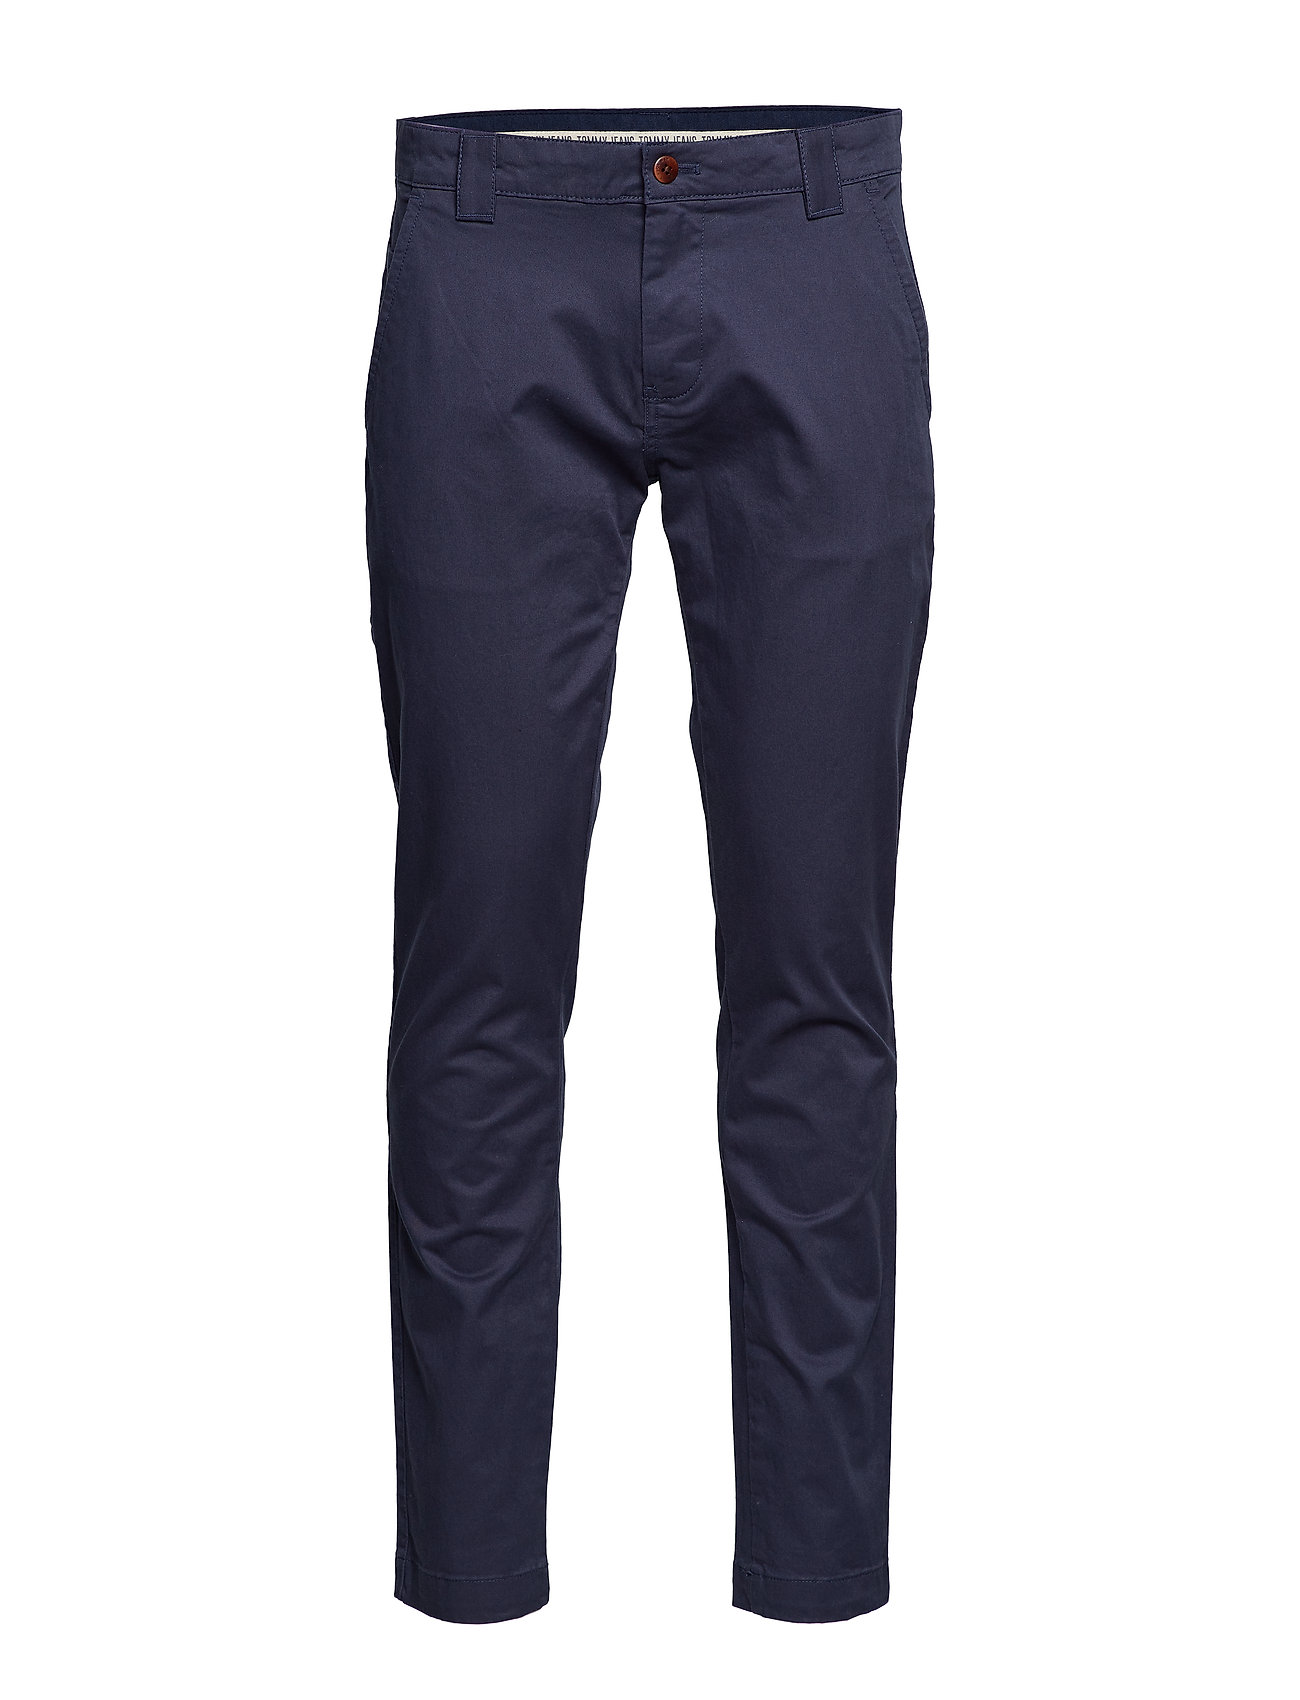 Tommy Jeans TJM SCANTON CHINO PANT - BLACK IRIS